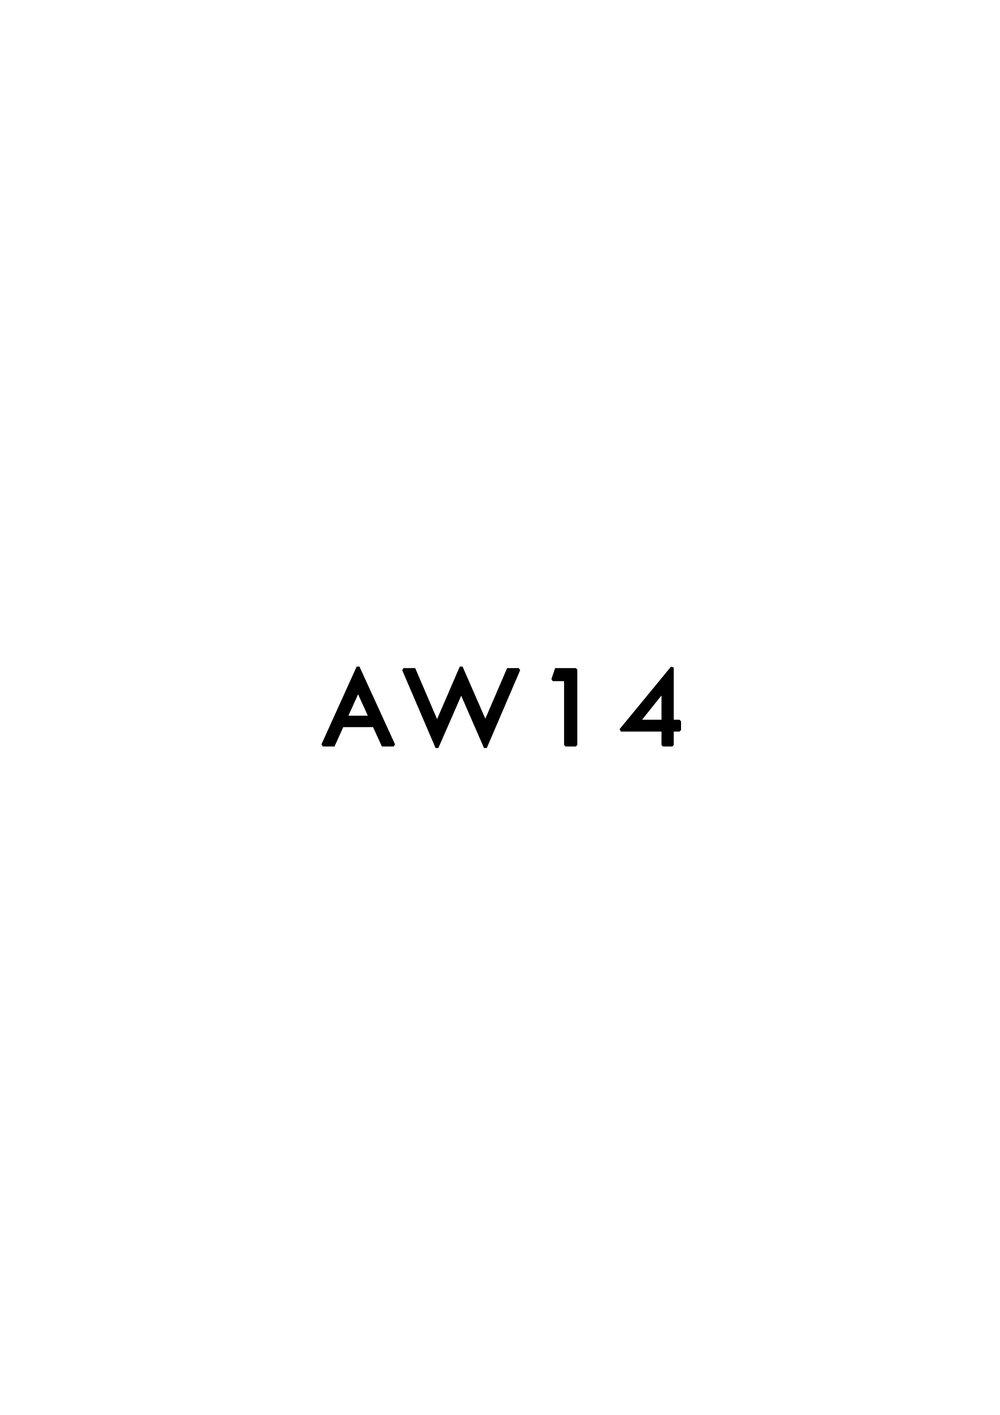 AW14.jpg